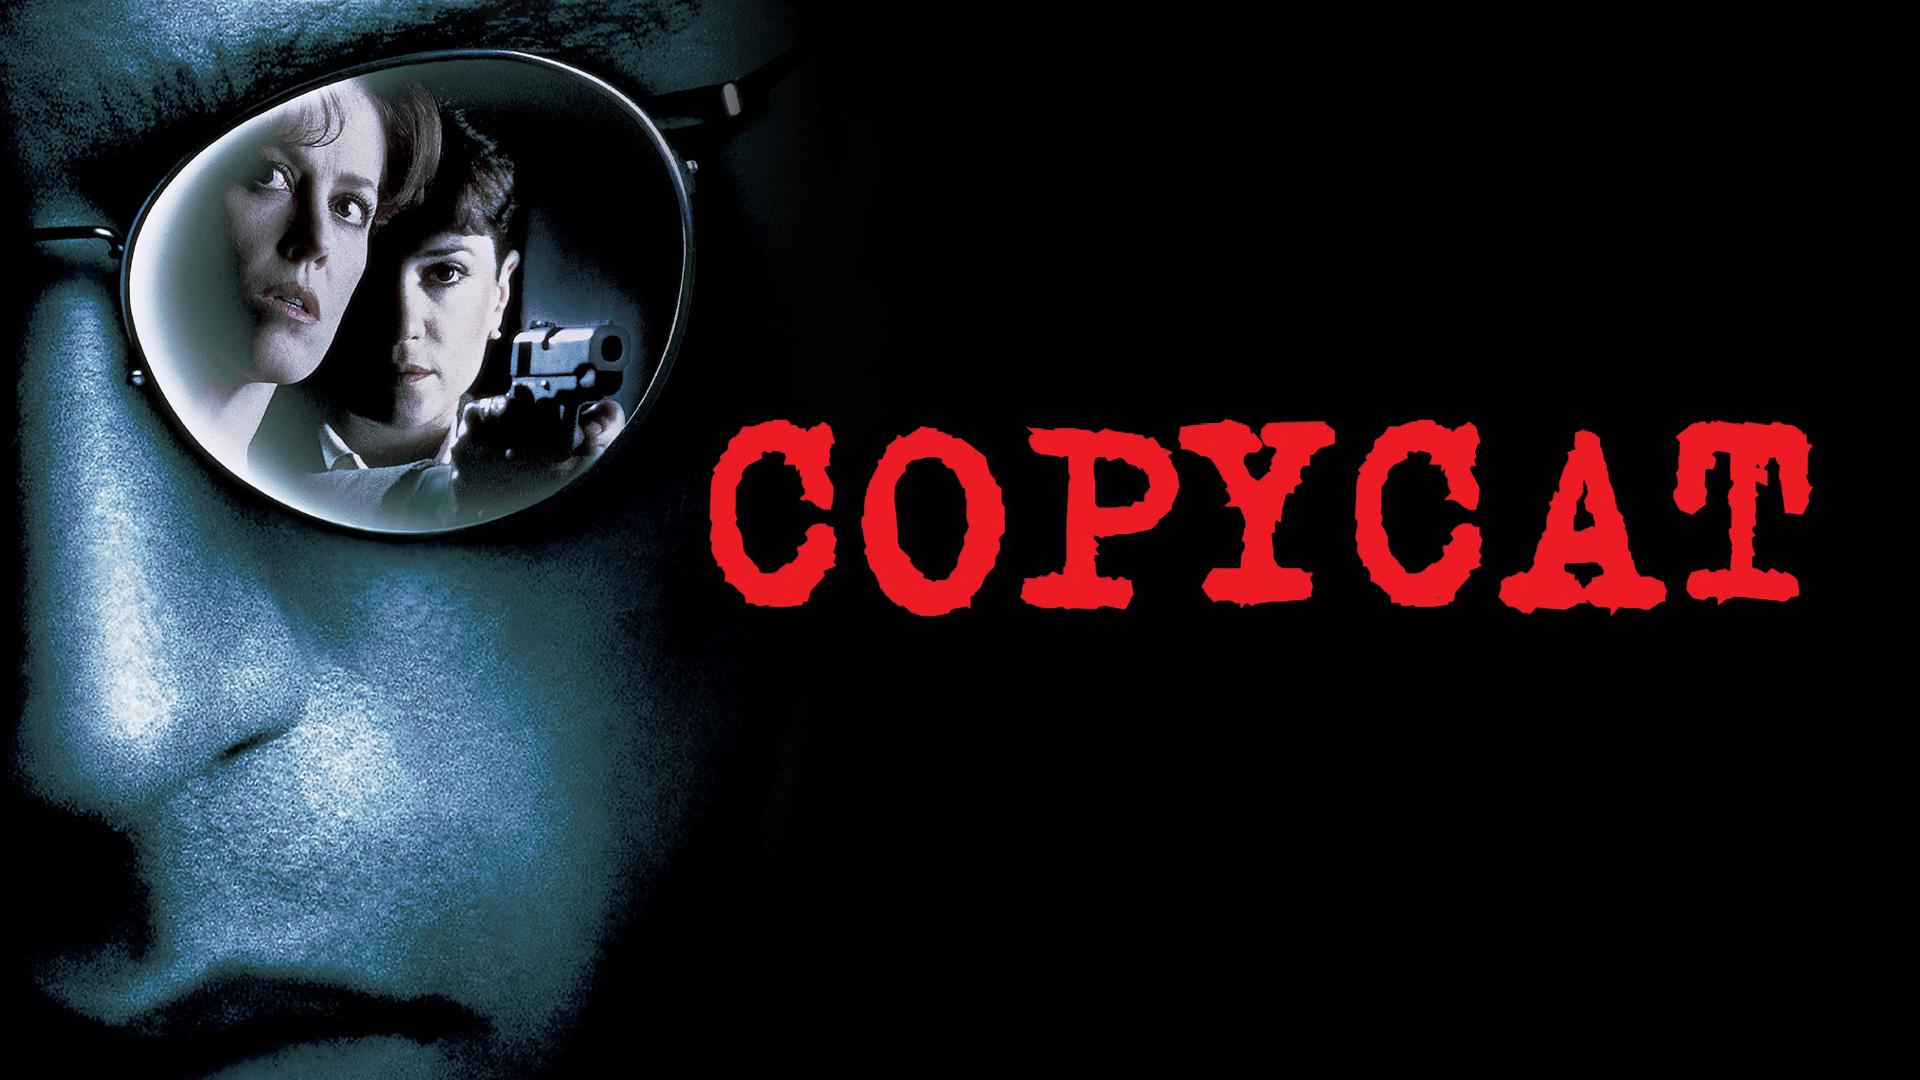 Copycat (字幕版)